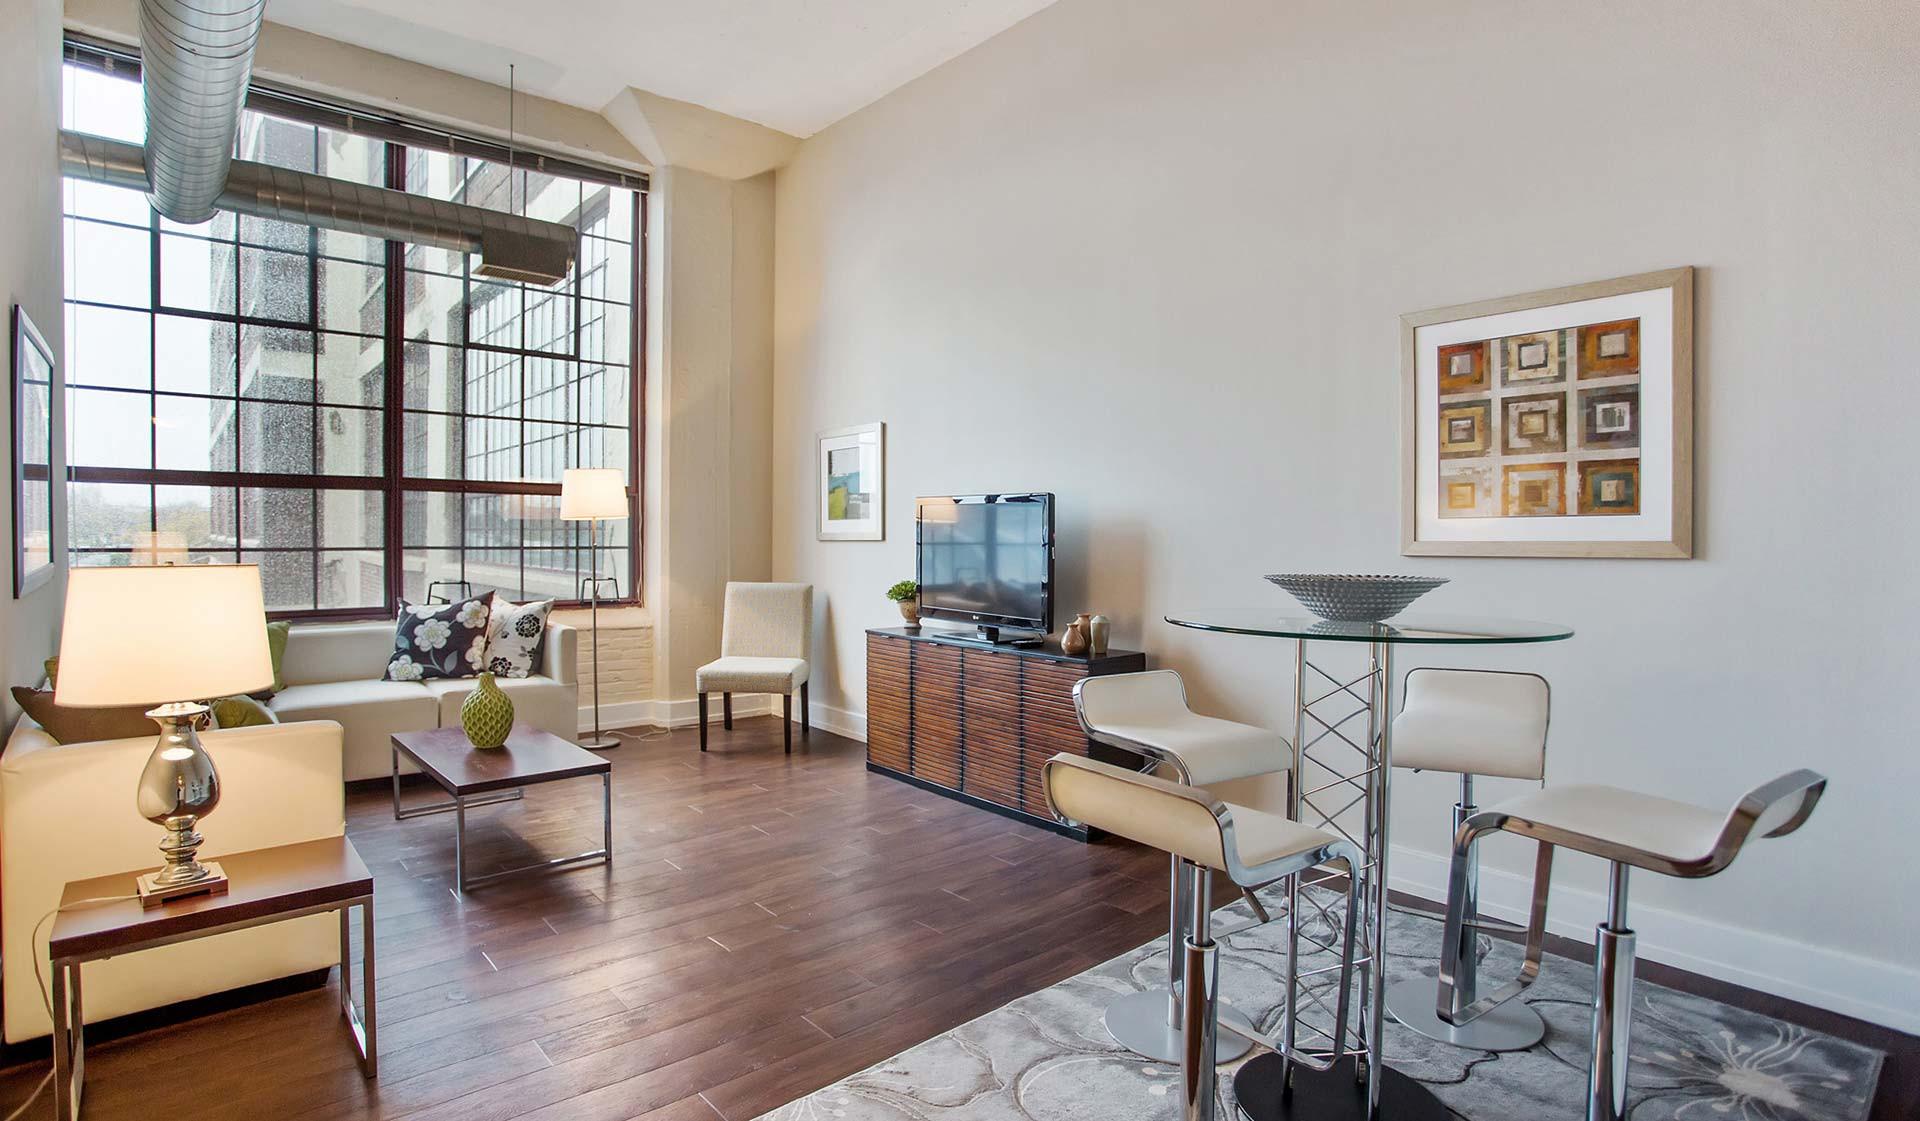 hardwood flooring washington ave philadelphia of 100 best 2 bedroom apartments in philadelphia pa regarding d366c53ade268c0d2f7303daf91723de